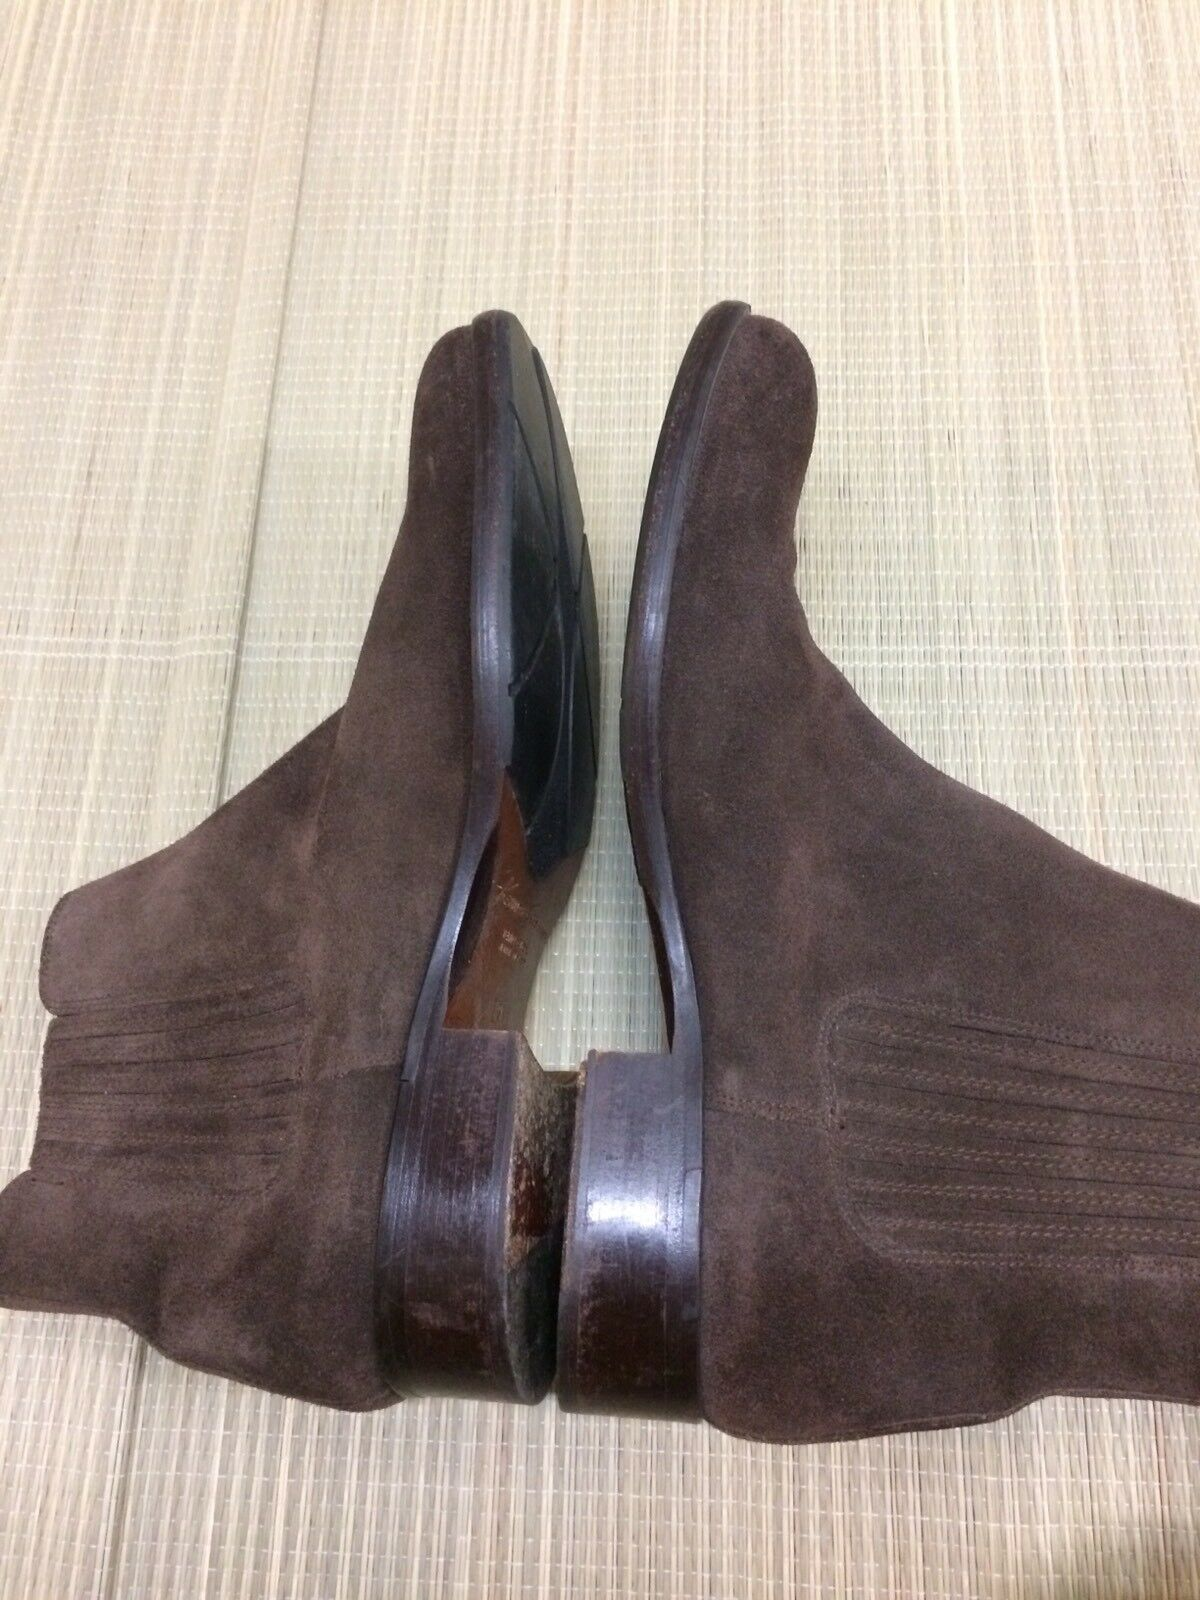 Kenneth Cole New York Chelsea Chelsea York Braun Suede Ankle Stiefel  Herren 9 Made In  EUC 8da823